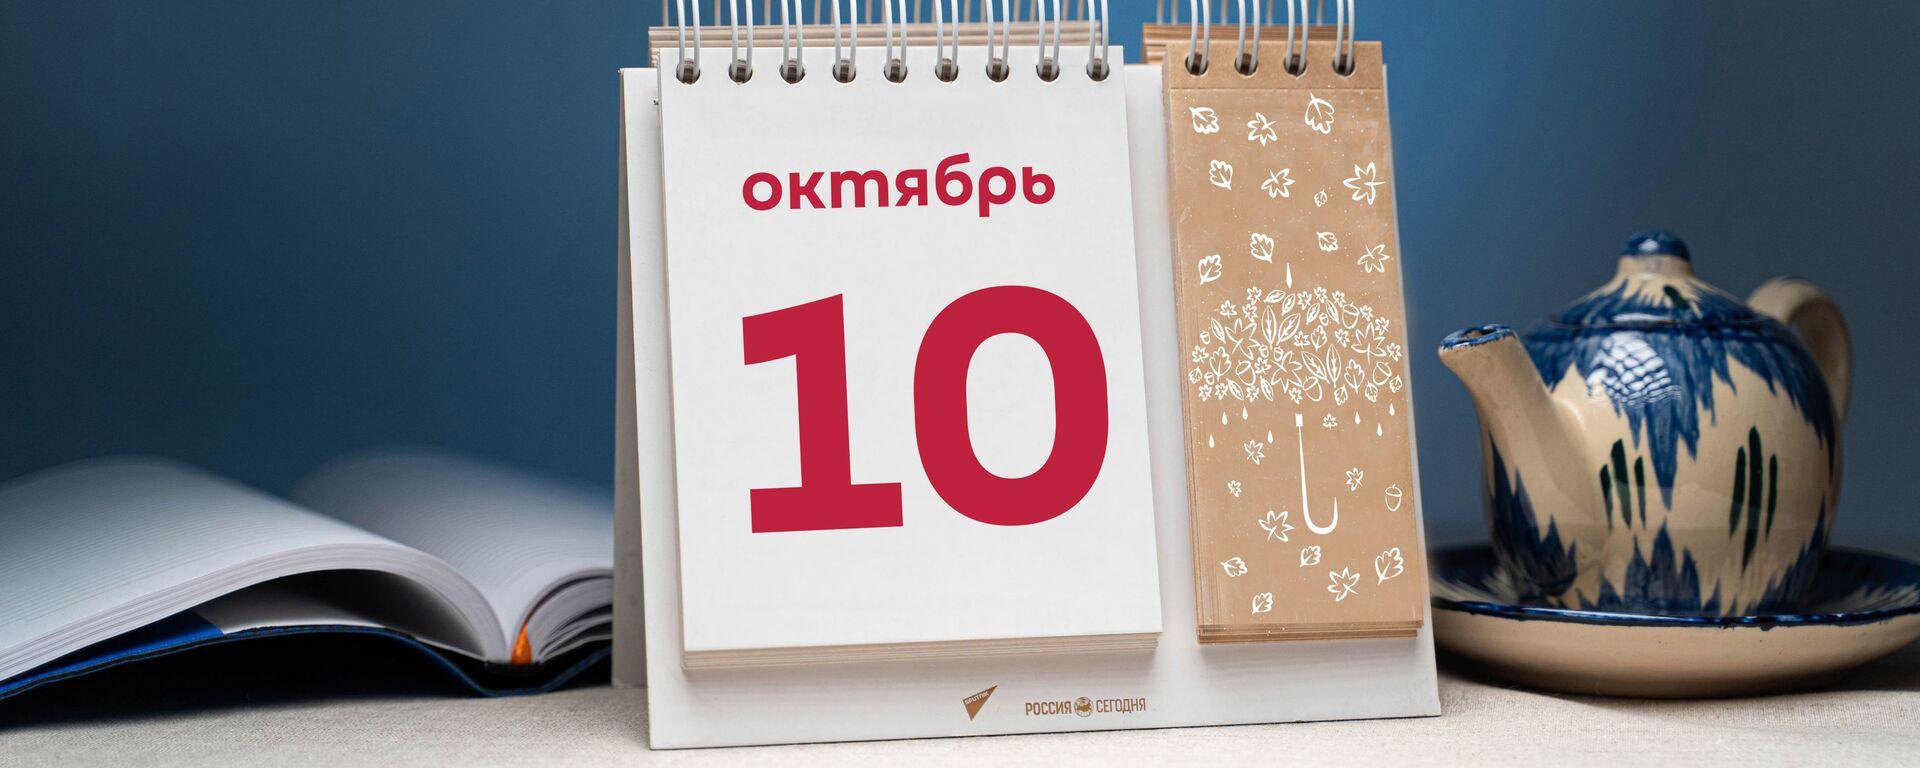 День 10 октября - Sputnik Тоҷикистон, 1920, 10.10.2021